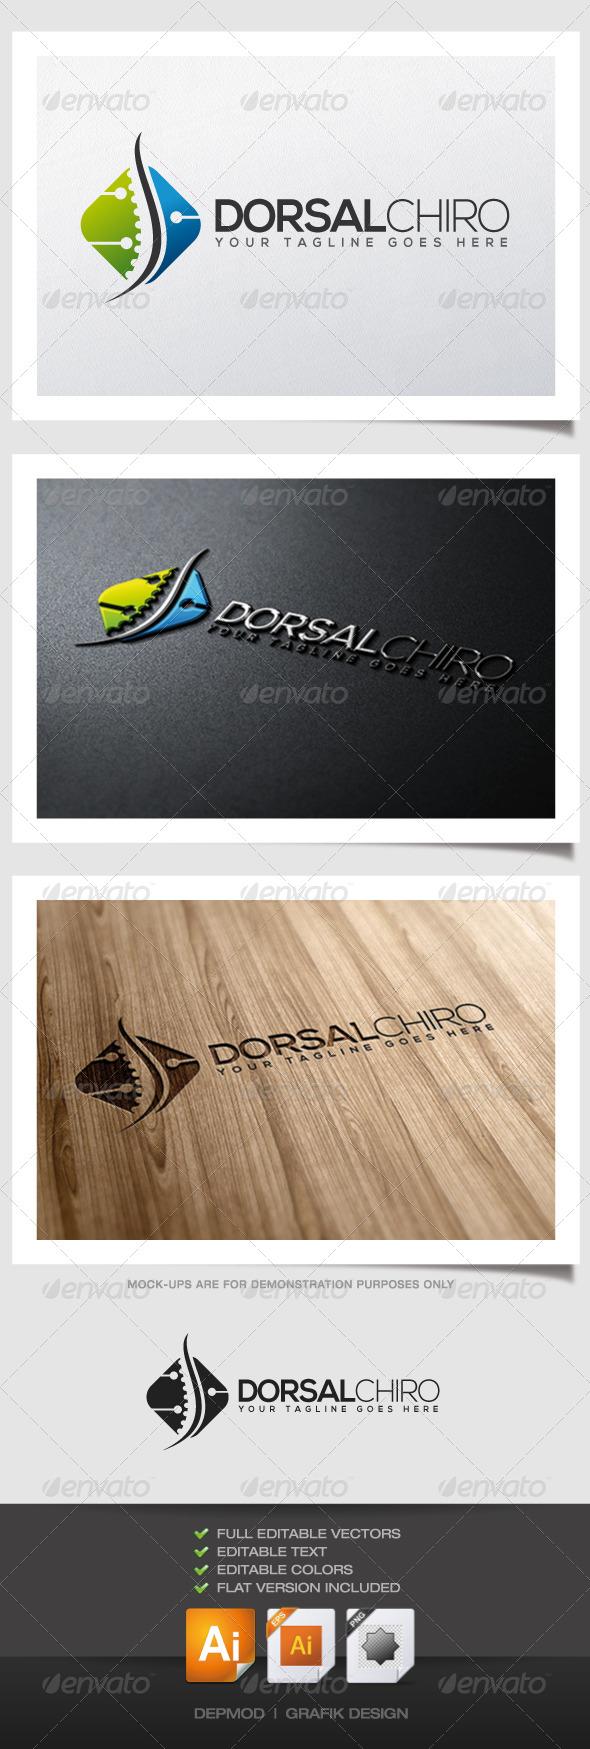 GraphicRiver Dorsal Chiro Logo 6216465